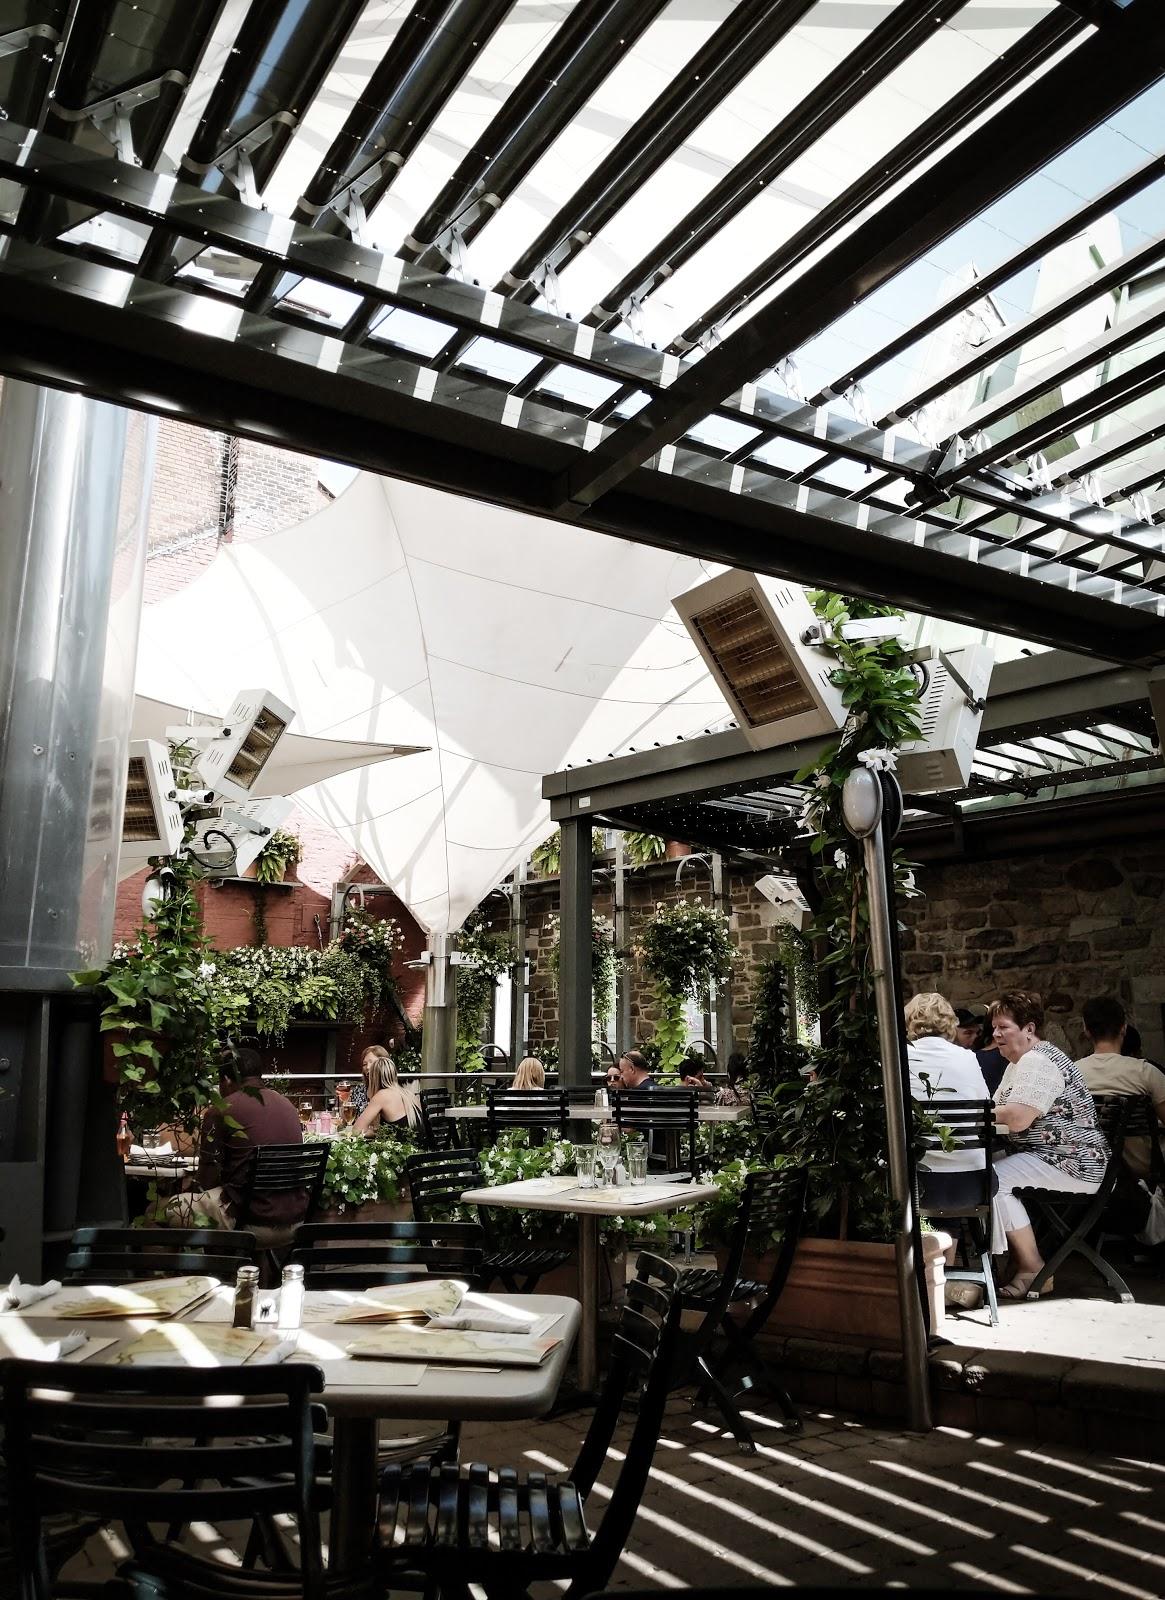 Seasonal restaurant patio with plants